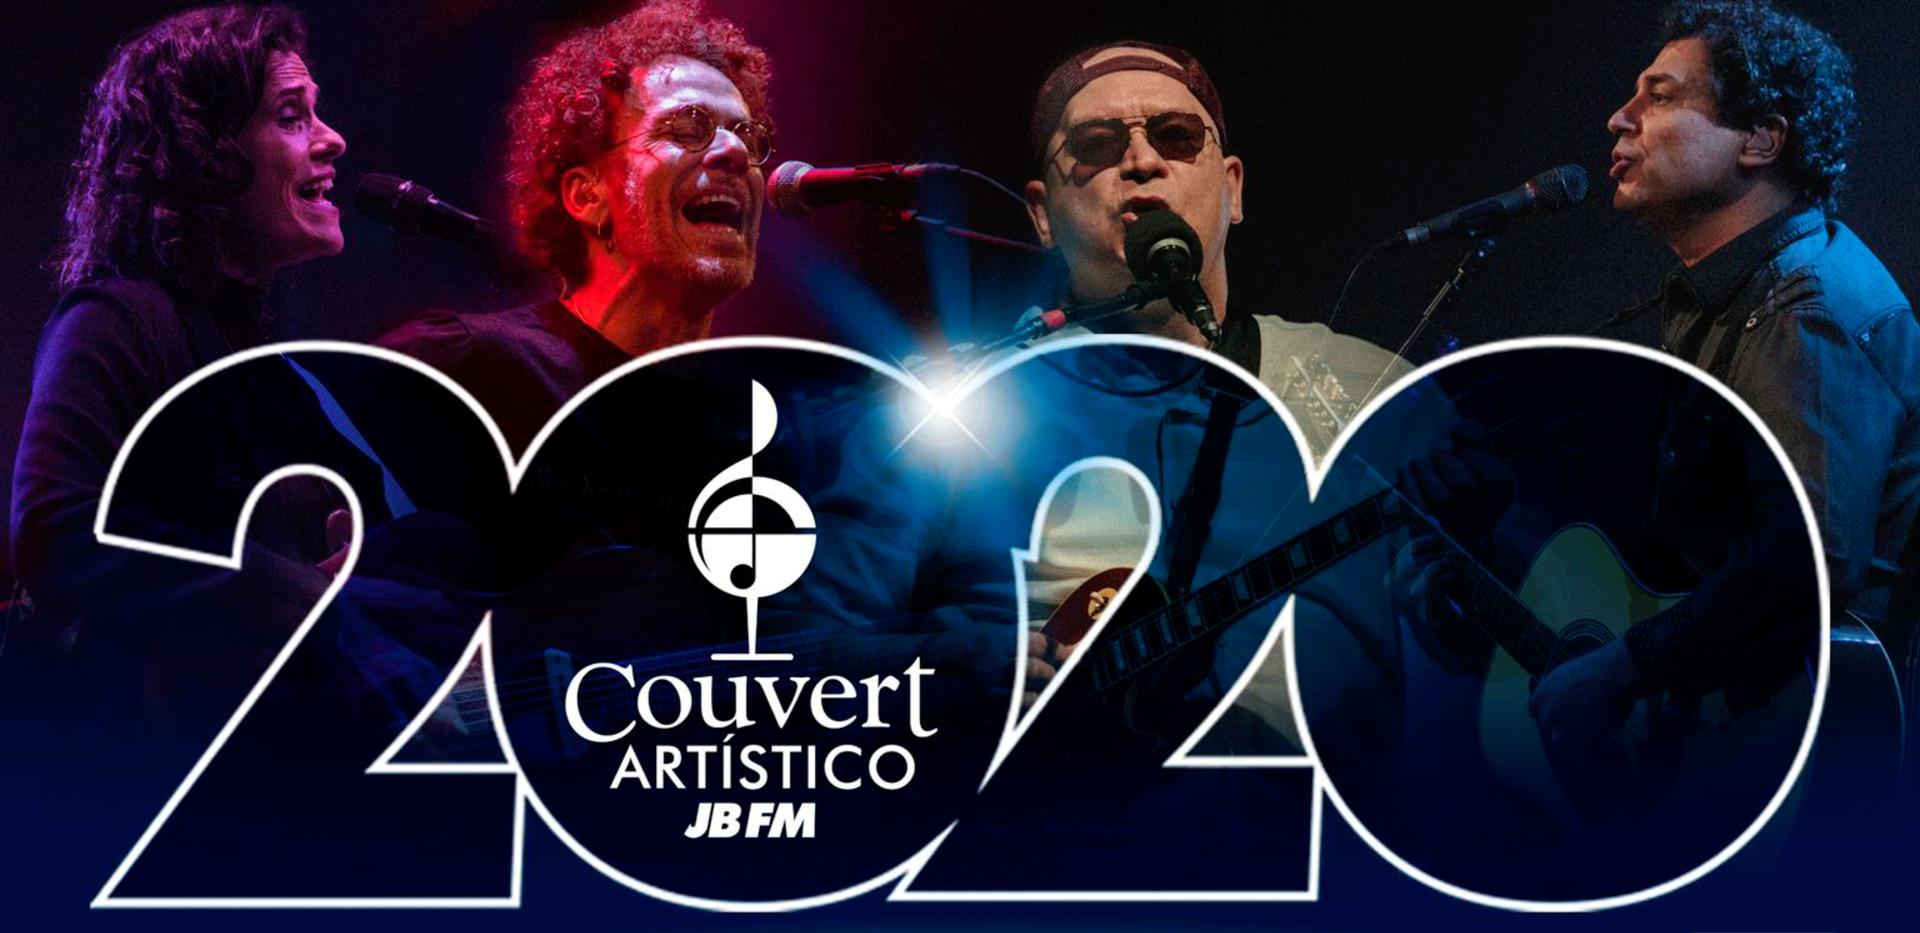 Couvert Artistico - JBFM